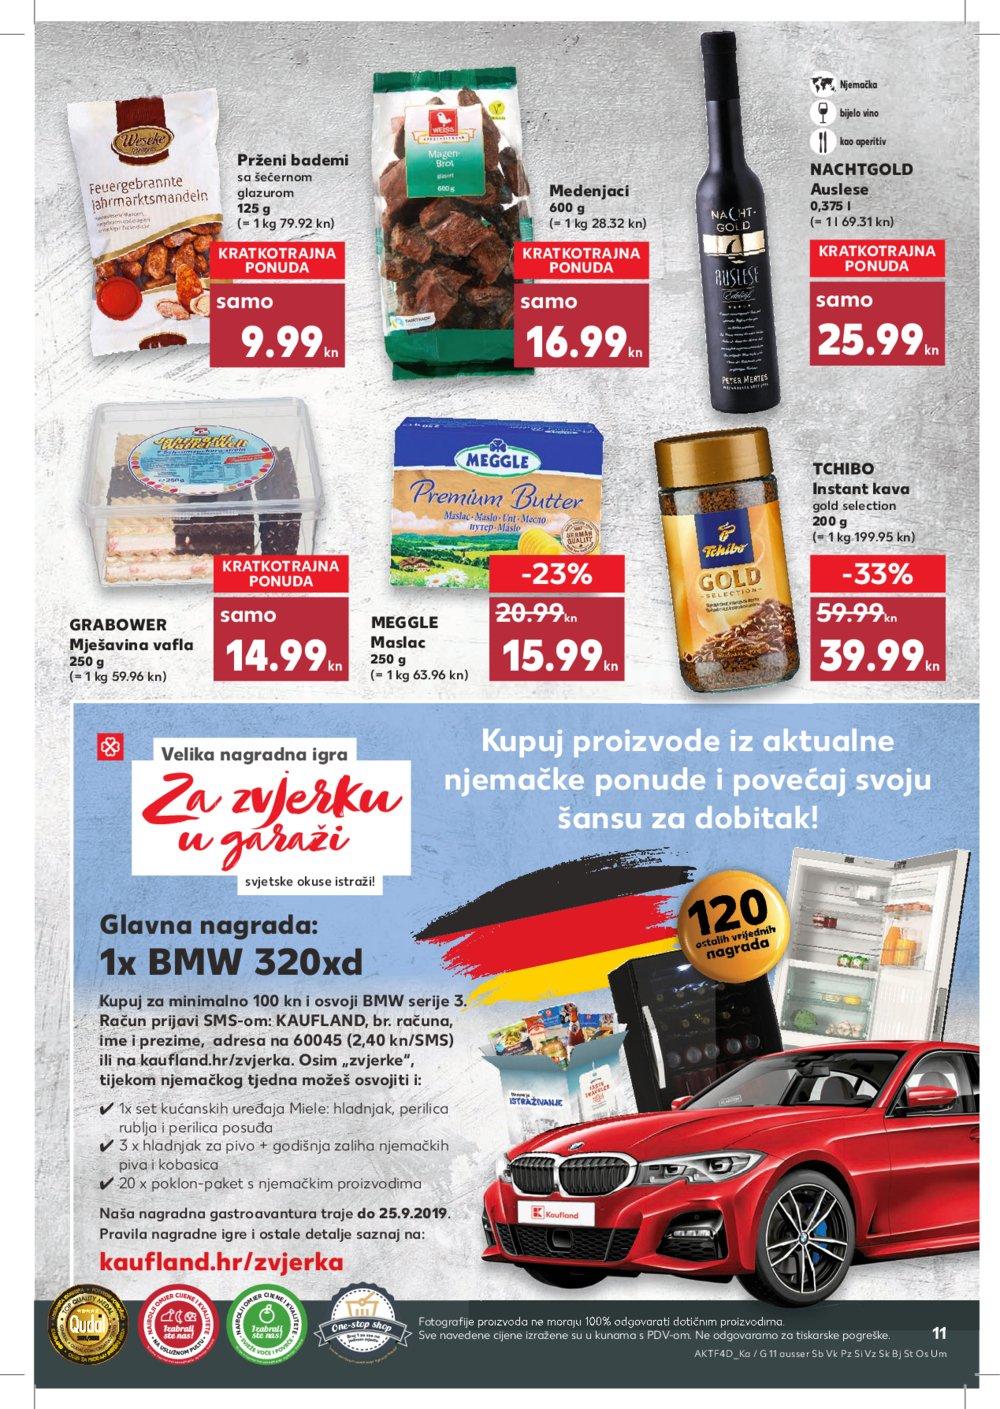 Kaufland katalog Akcija 12.09.-18.09.2019.